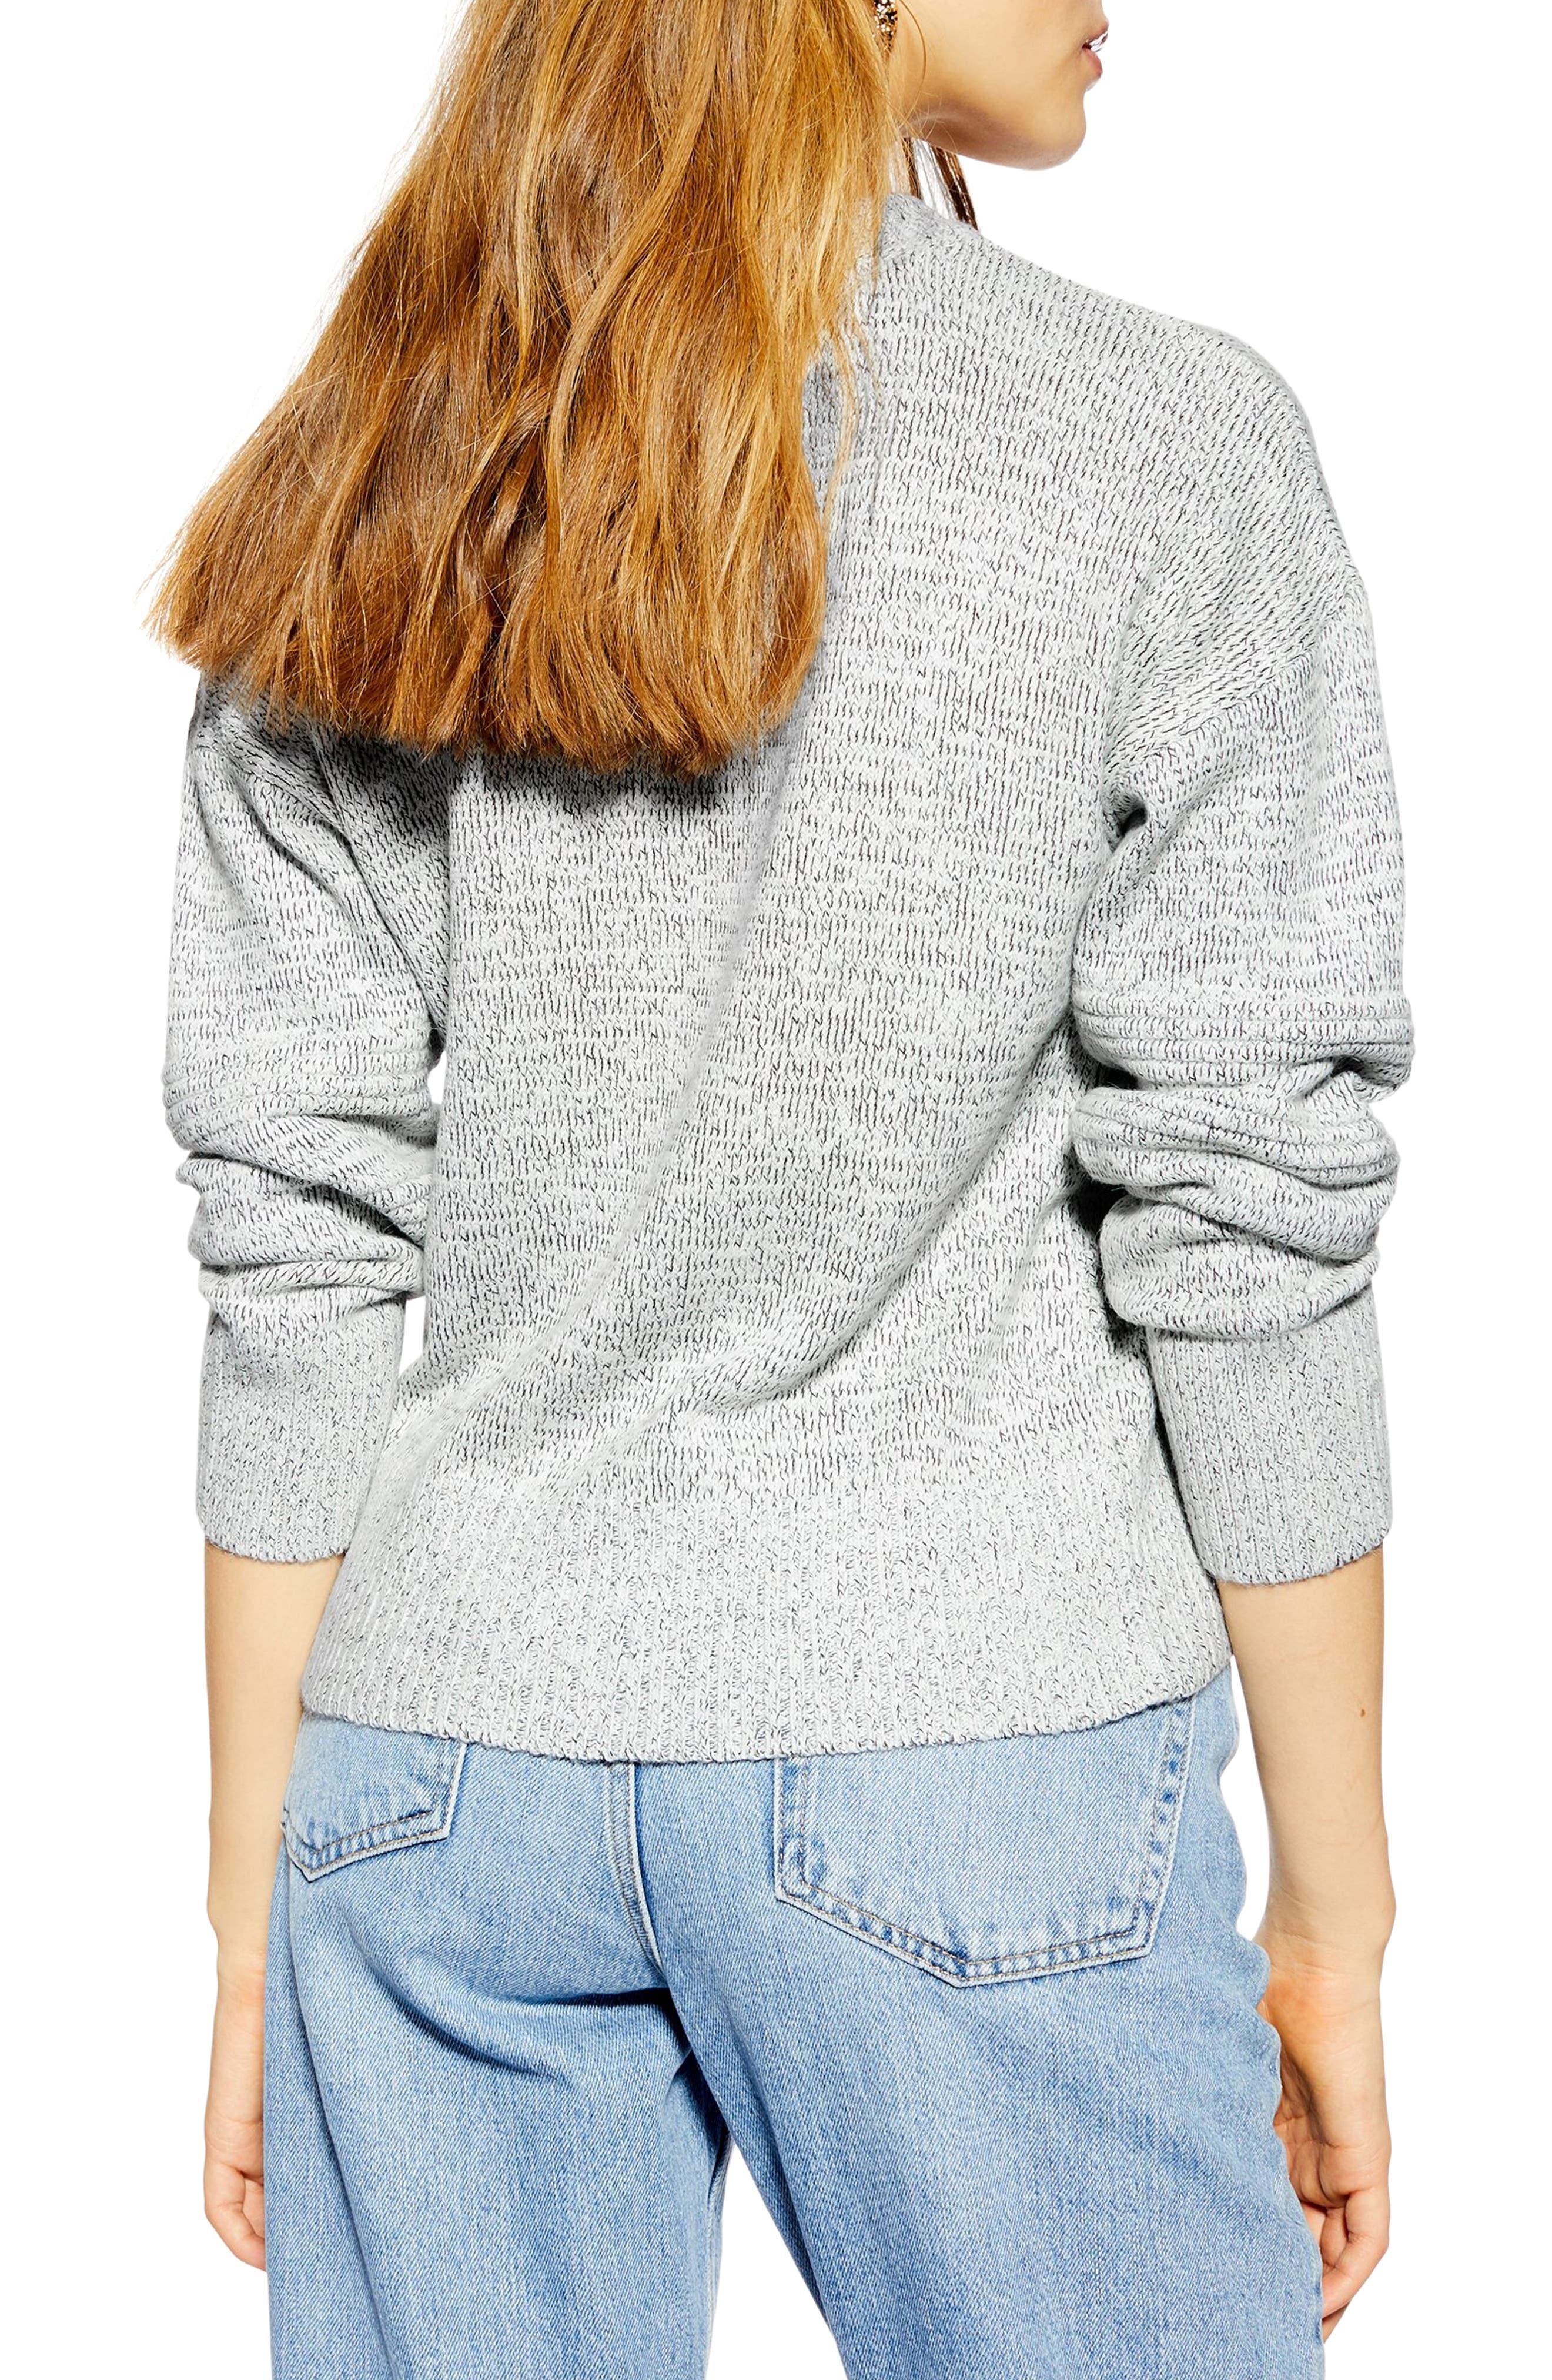 TOPSHOP,                             Ottoman Stitch Sweater,                             Alternate thumbnail 2, color,                             GREY MARL